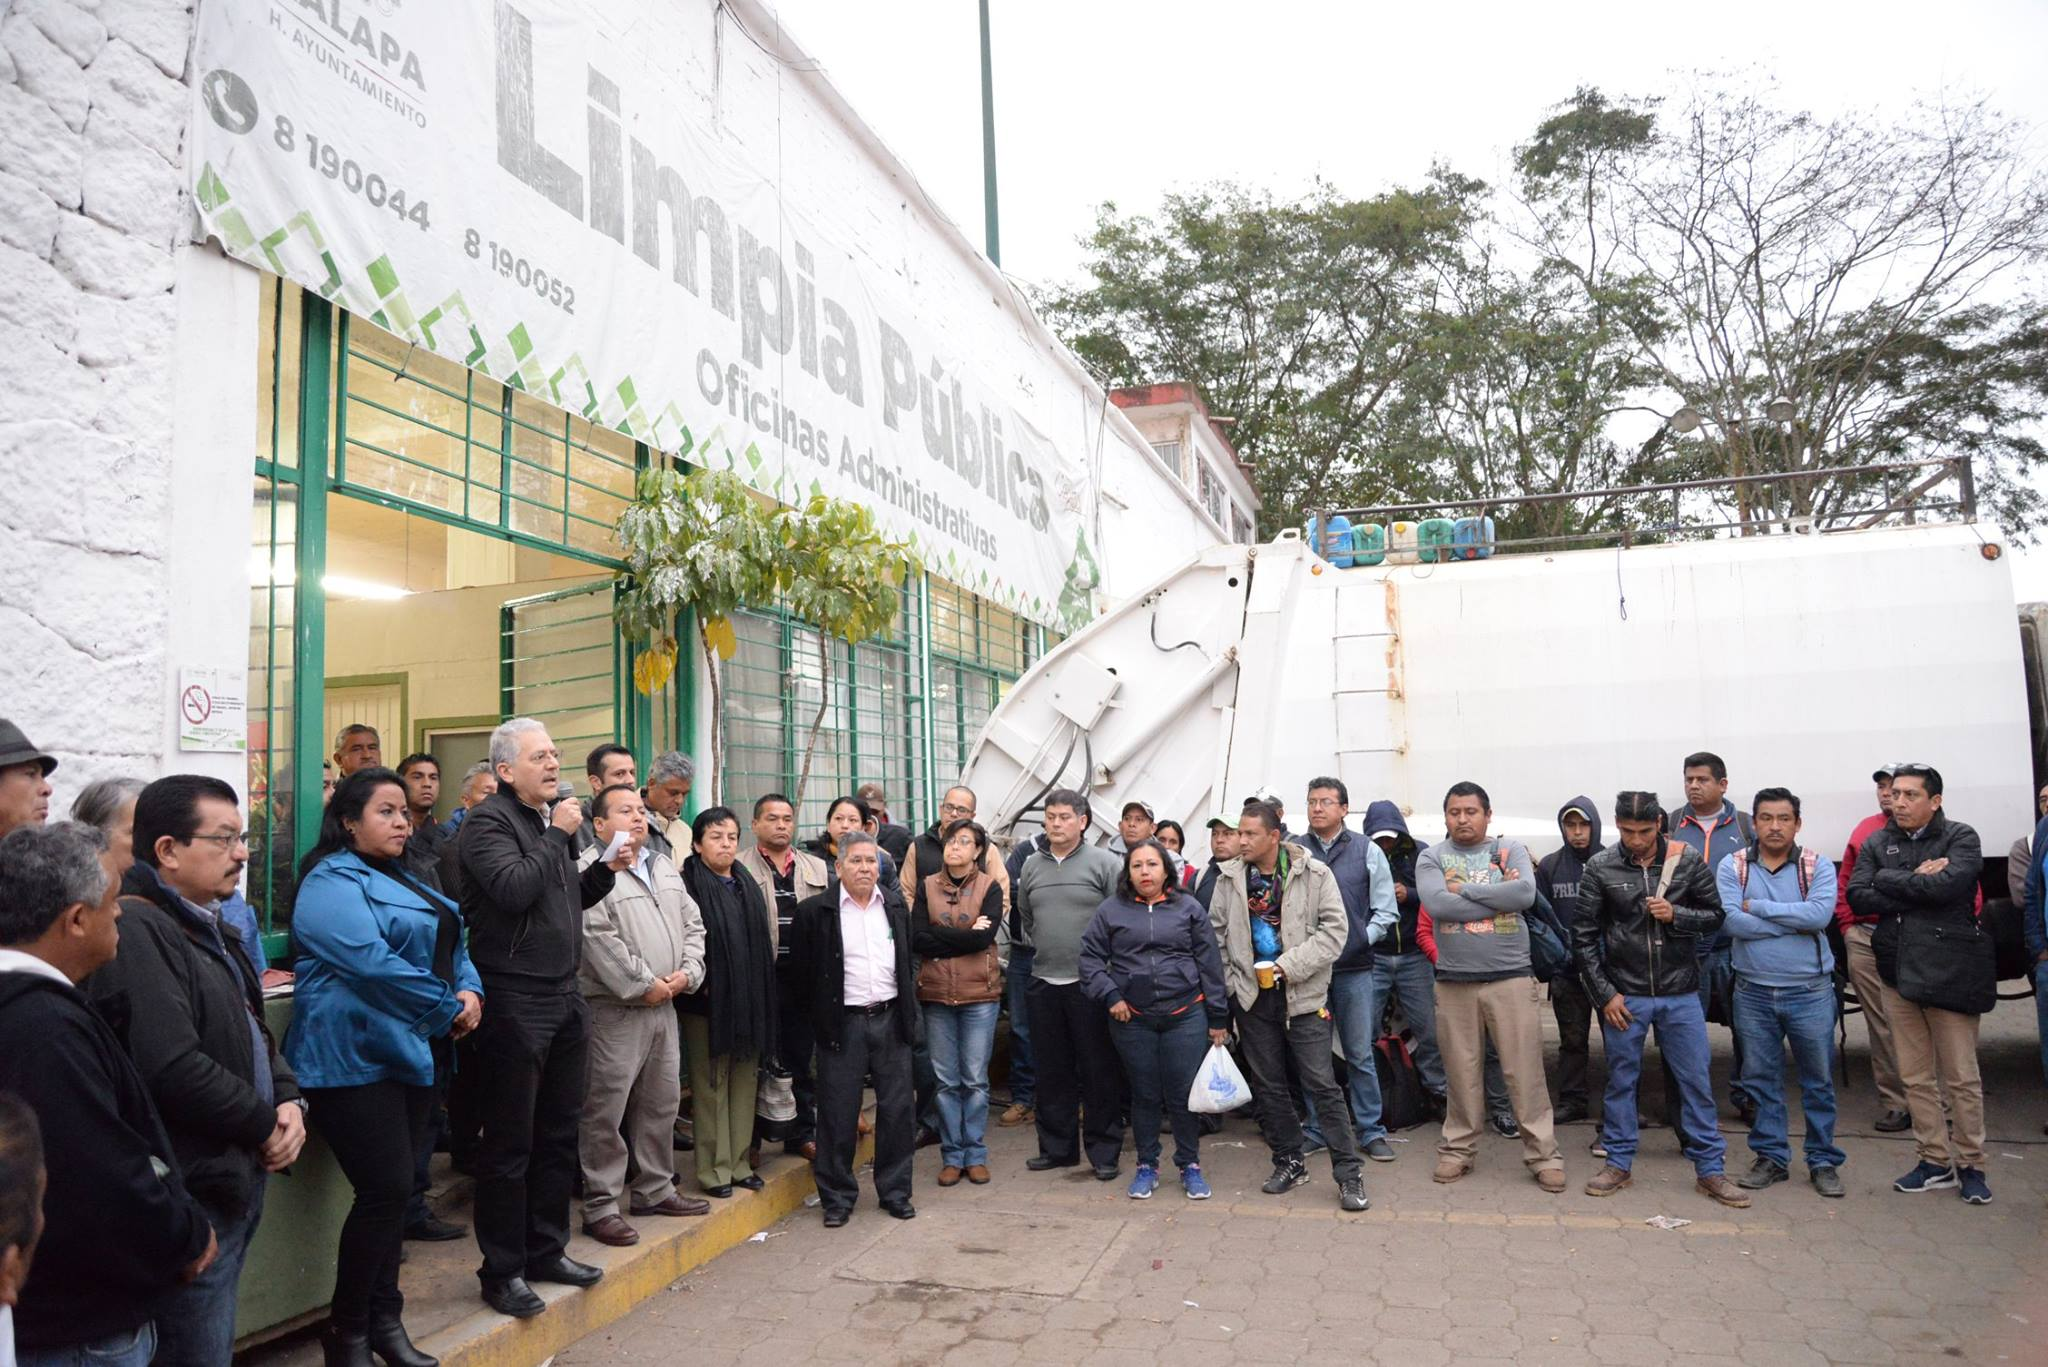 Limpia pública no se privatiza: Hipólito Rodríguez